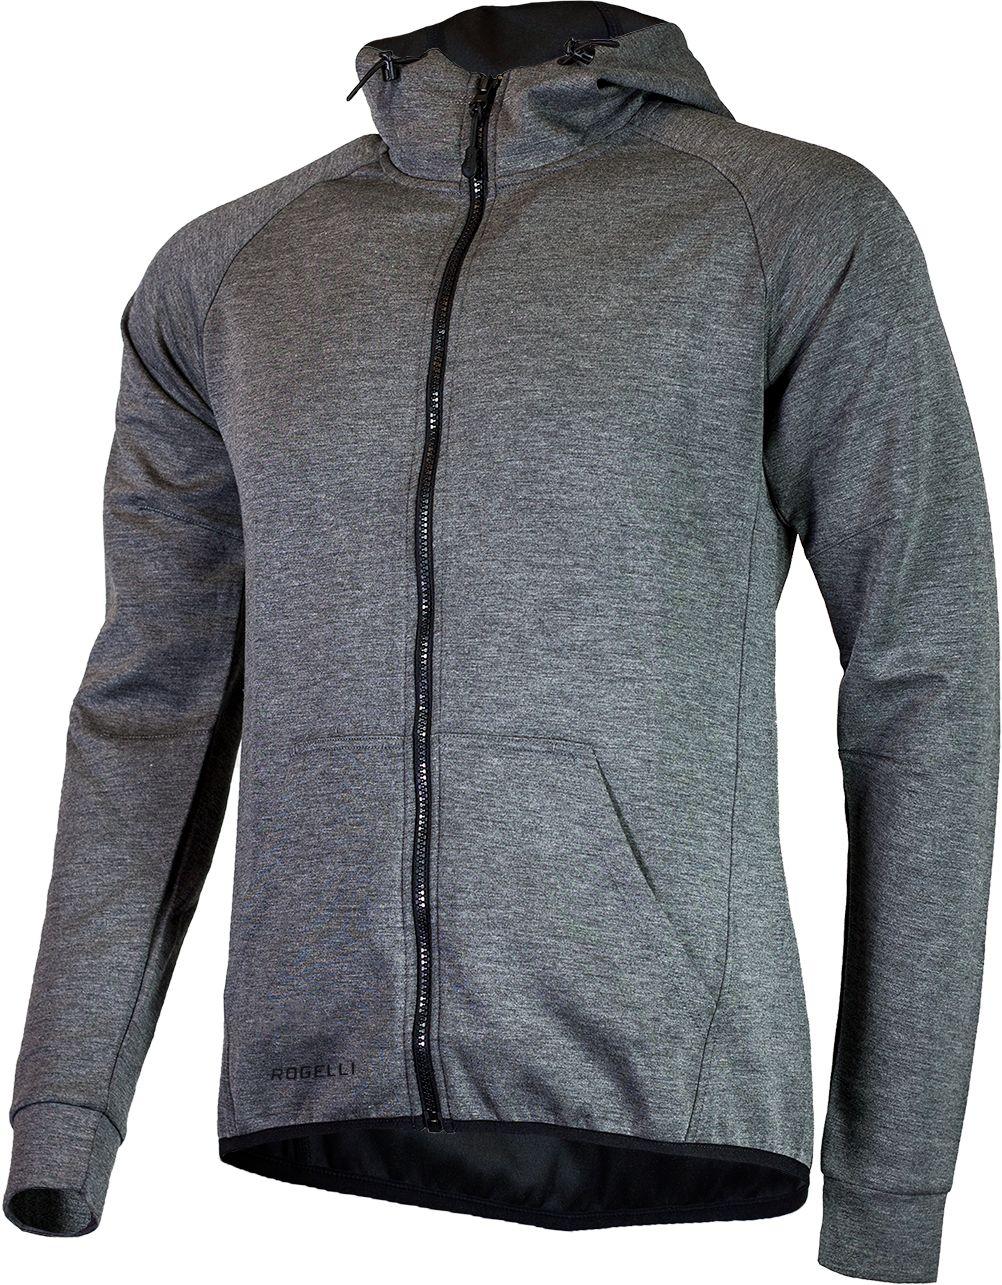 ROGELLI bluza męska z kapturem TRENING grey Rozmiar: 2XL,050.600.XL